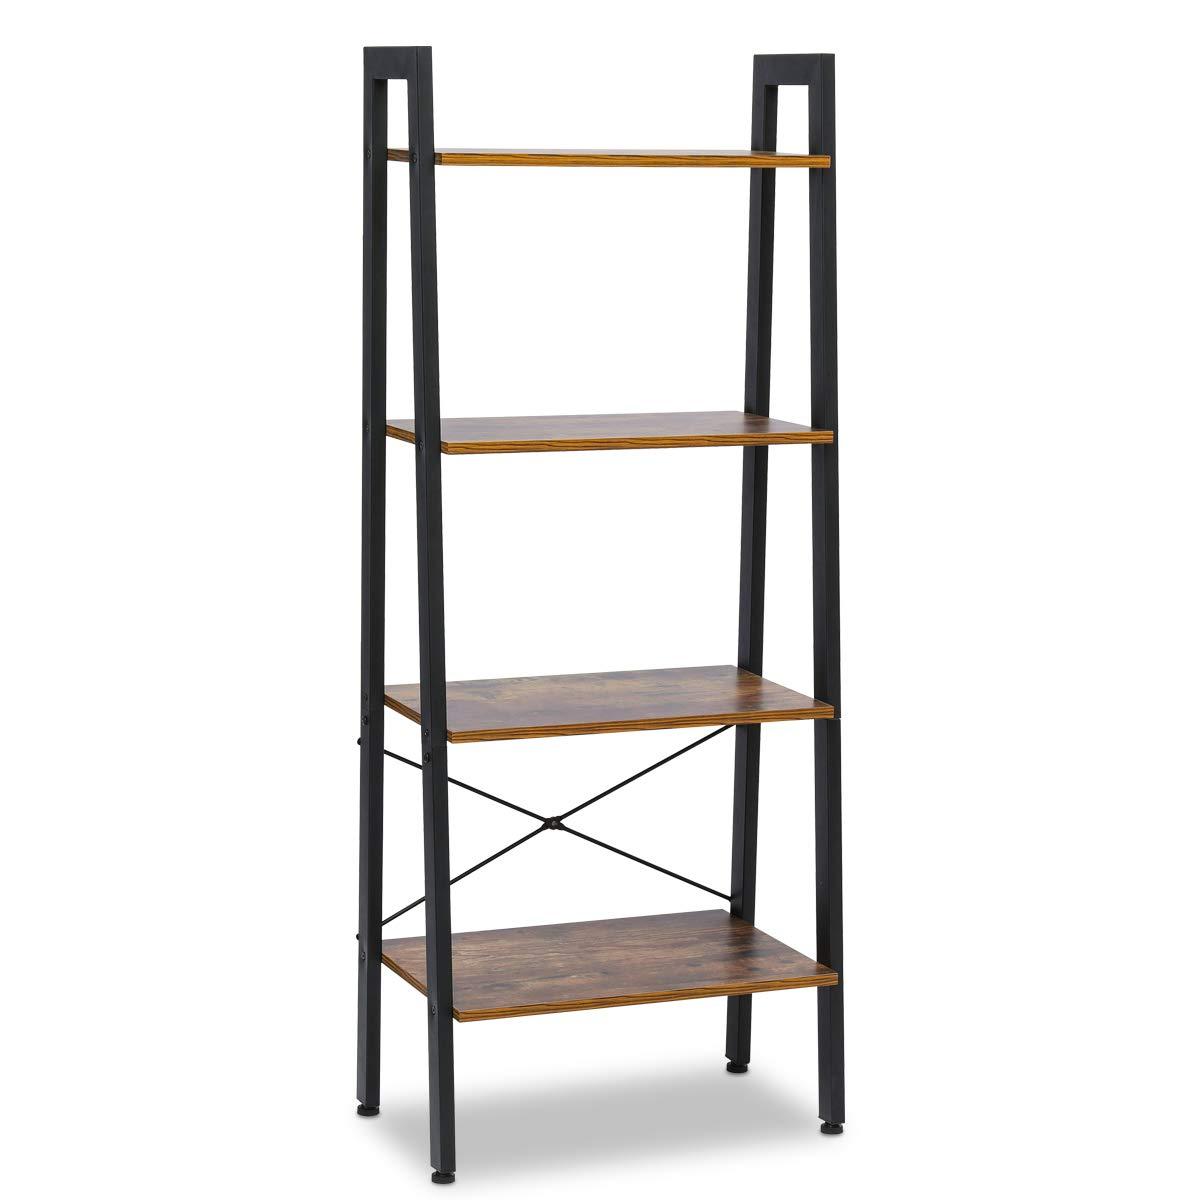 KingSo Industrial Ladder Shelf 4-Tier Shelves Vintage Rustic Storage Rack Shelves with Wood Look and Metal Frame Furniture for Living Room Study Lounge Bedroom Office by KingSo